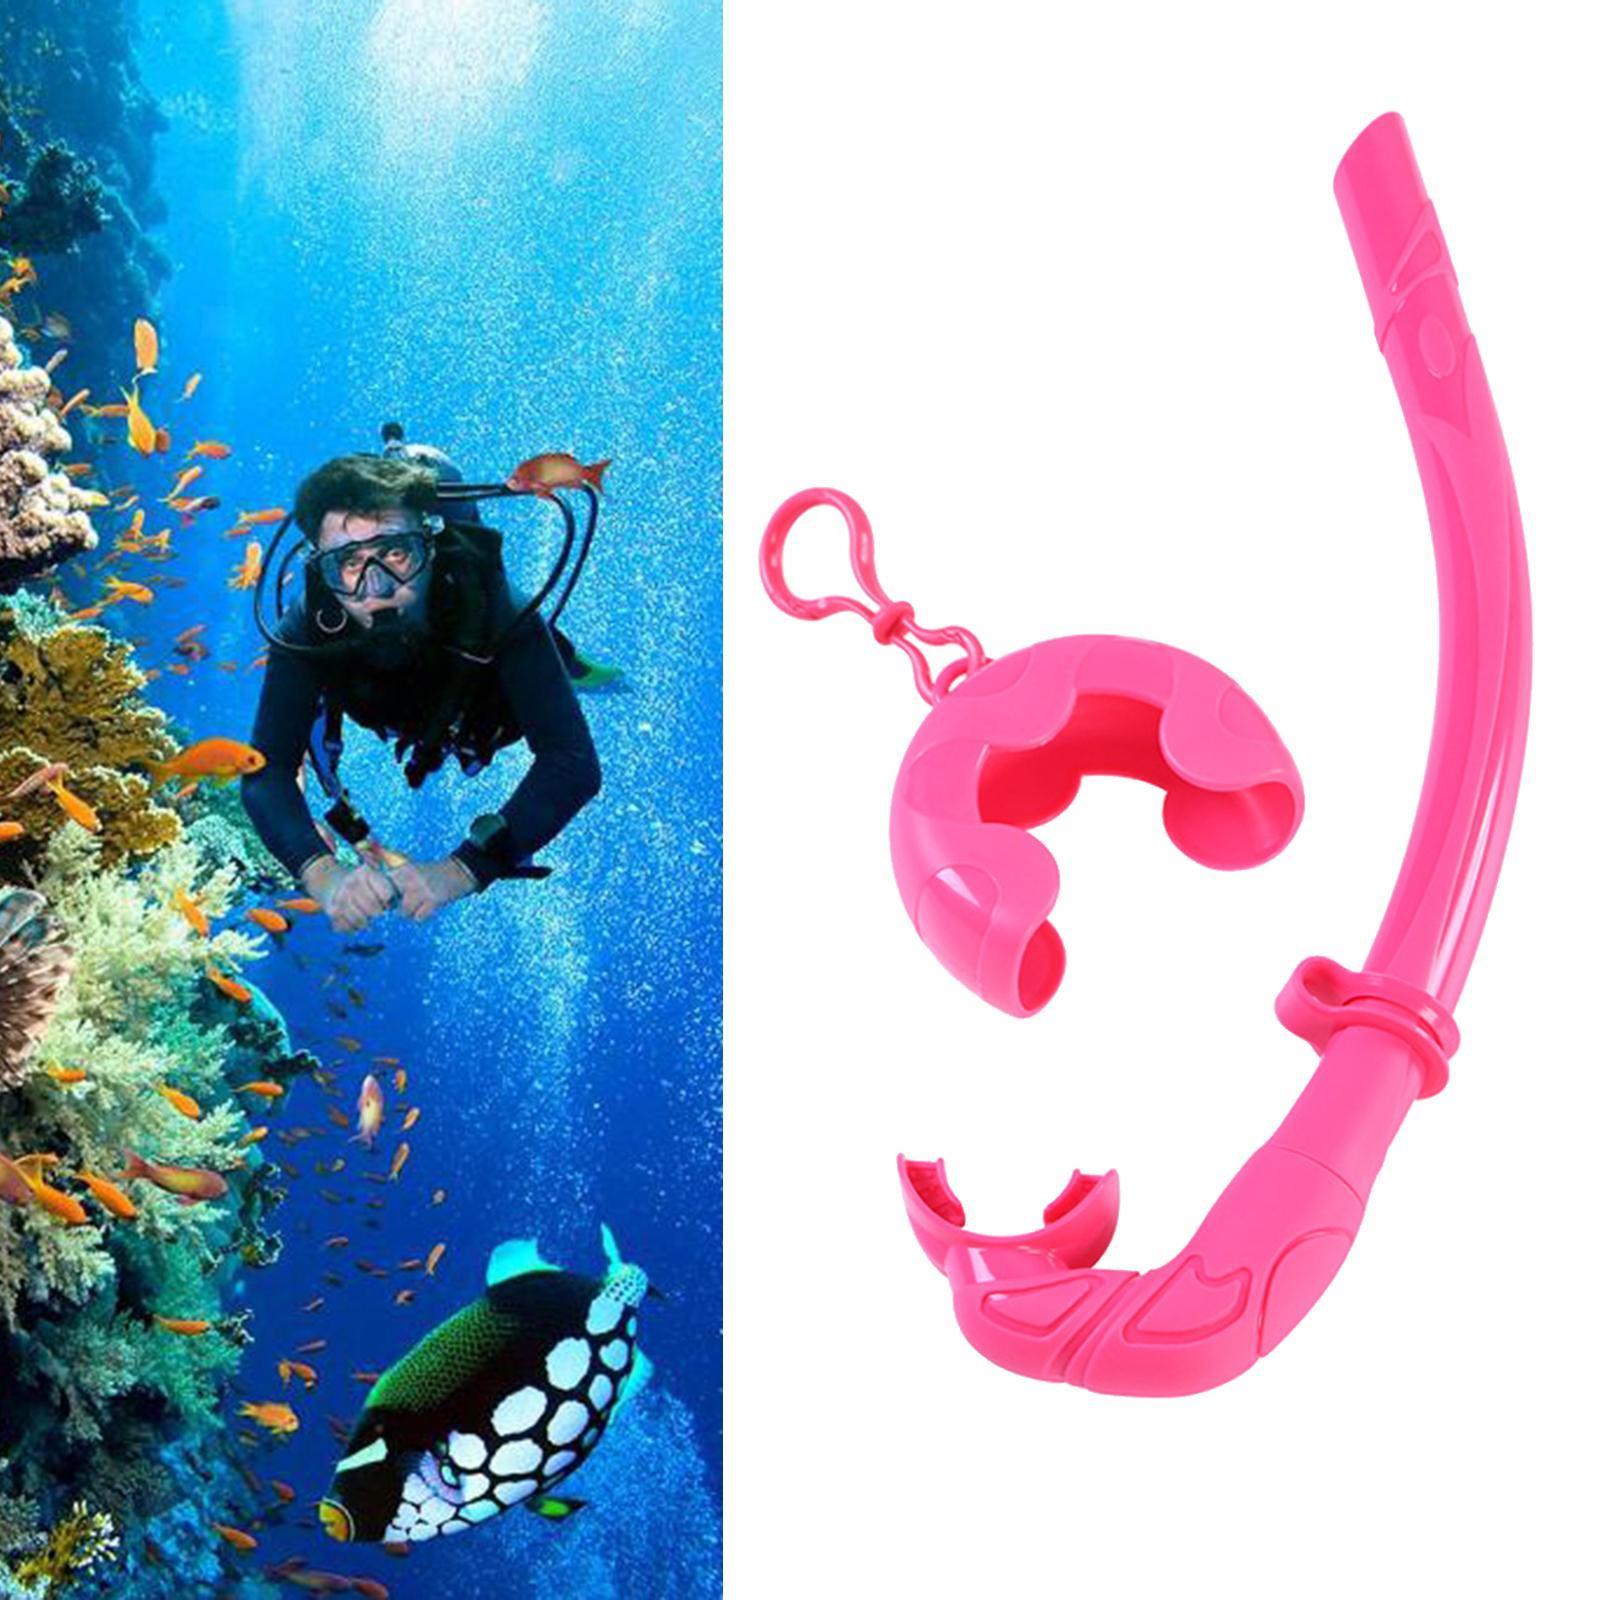 Indexbild 14 - Premium Wet Snorkel Women Men Adults Snorkels Breathing Tube Breath Tube